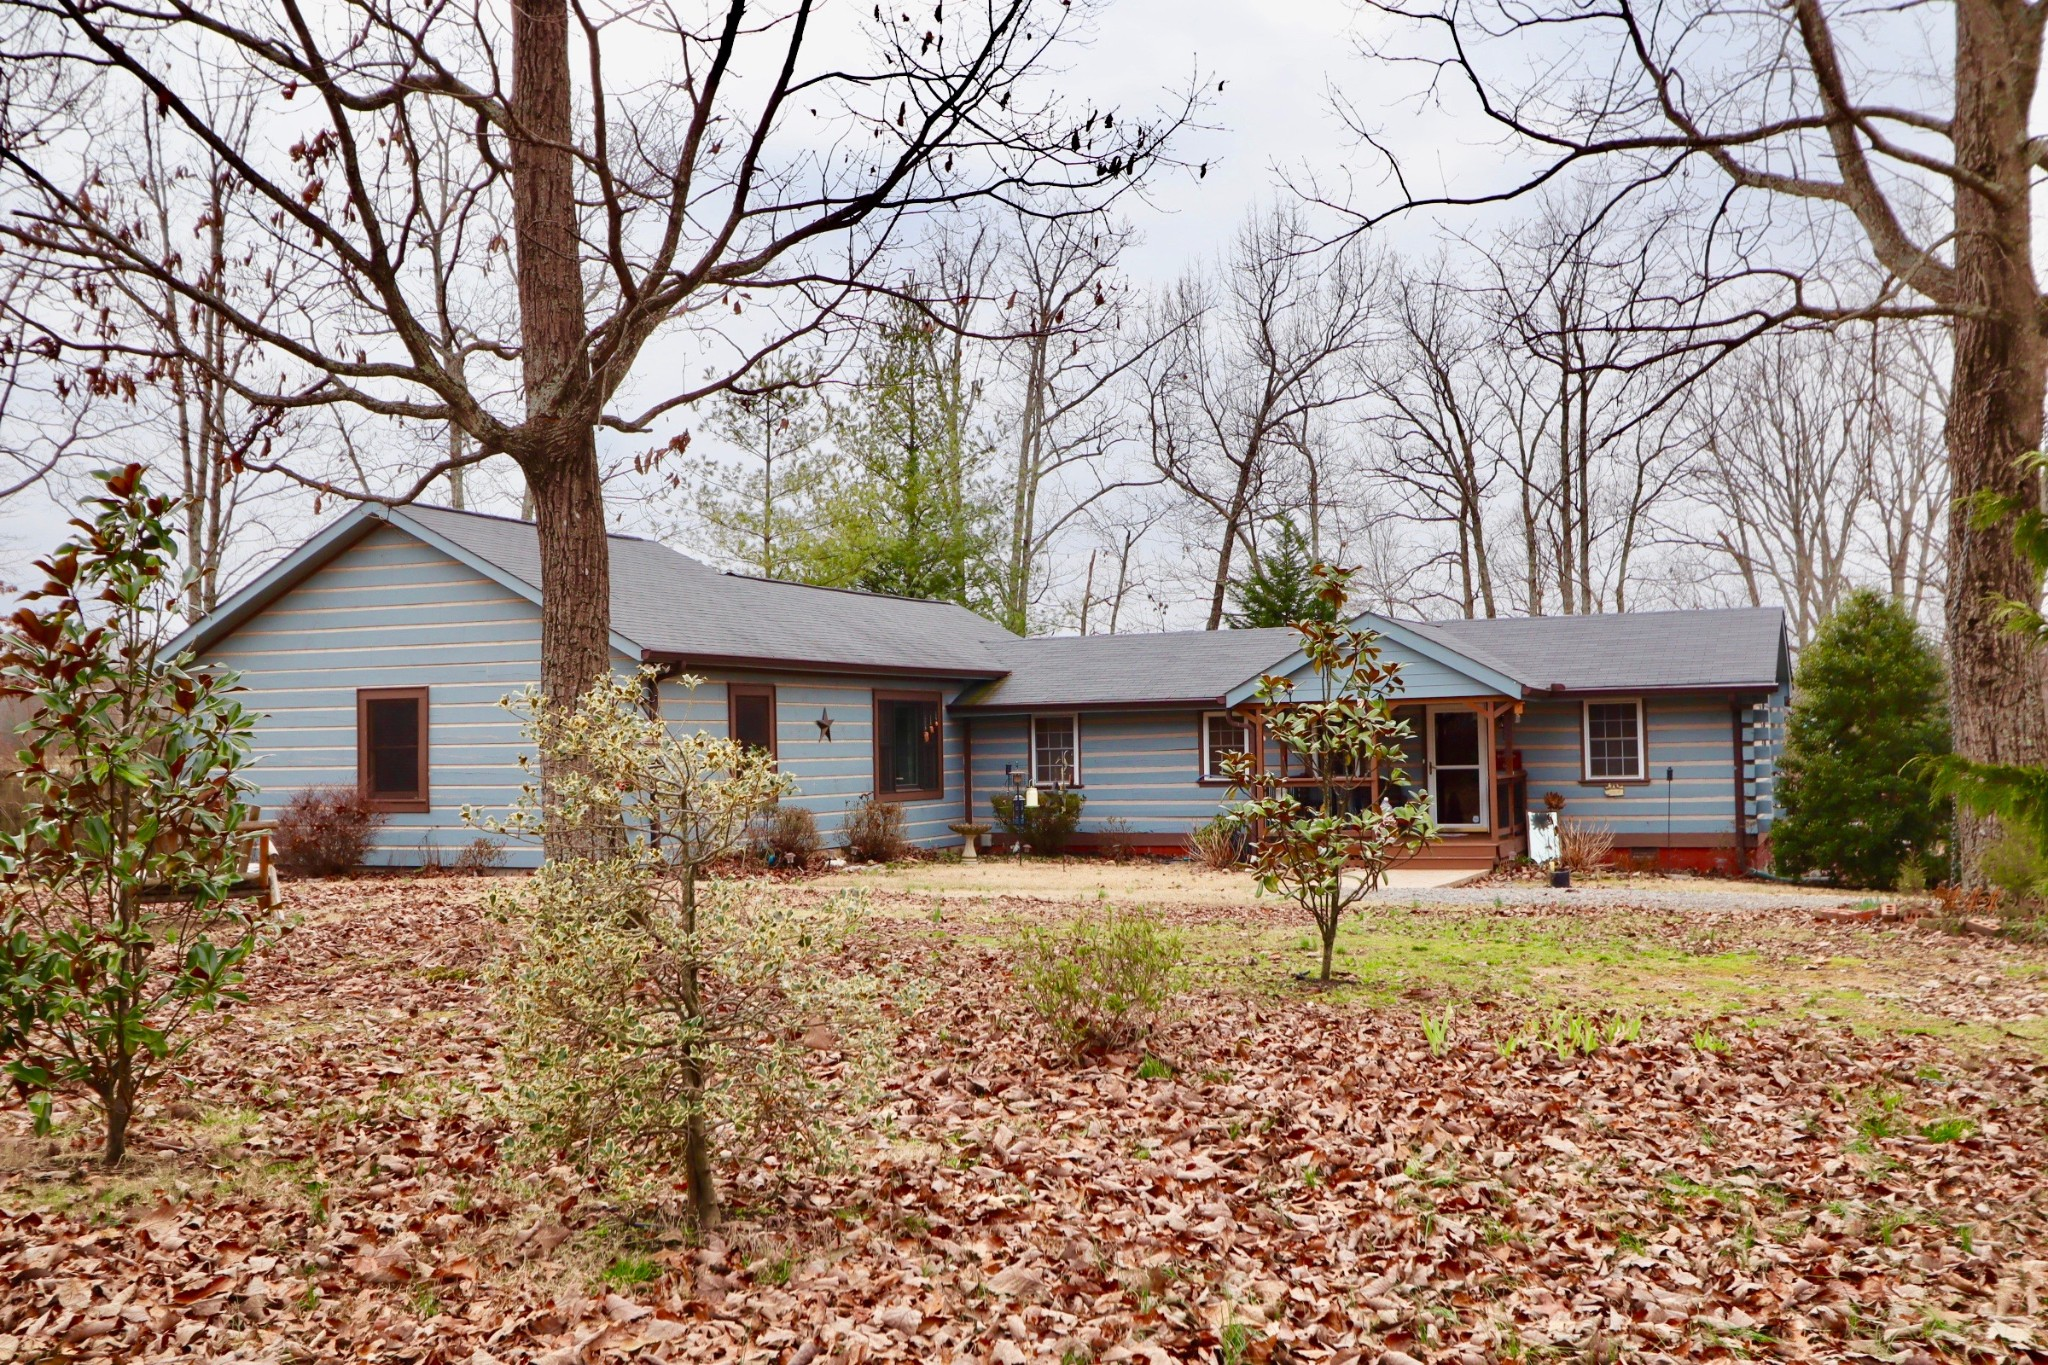 5298 Old Sams Creek RD, Pegram, TN 37143 - Pegram, TN real estate listing